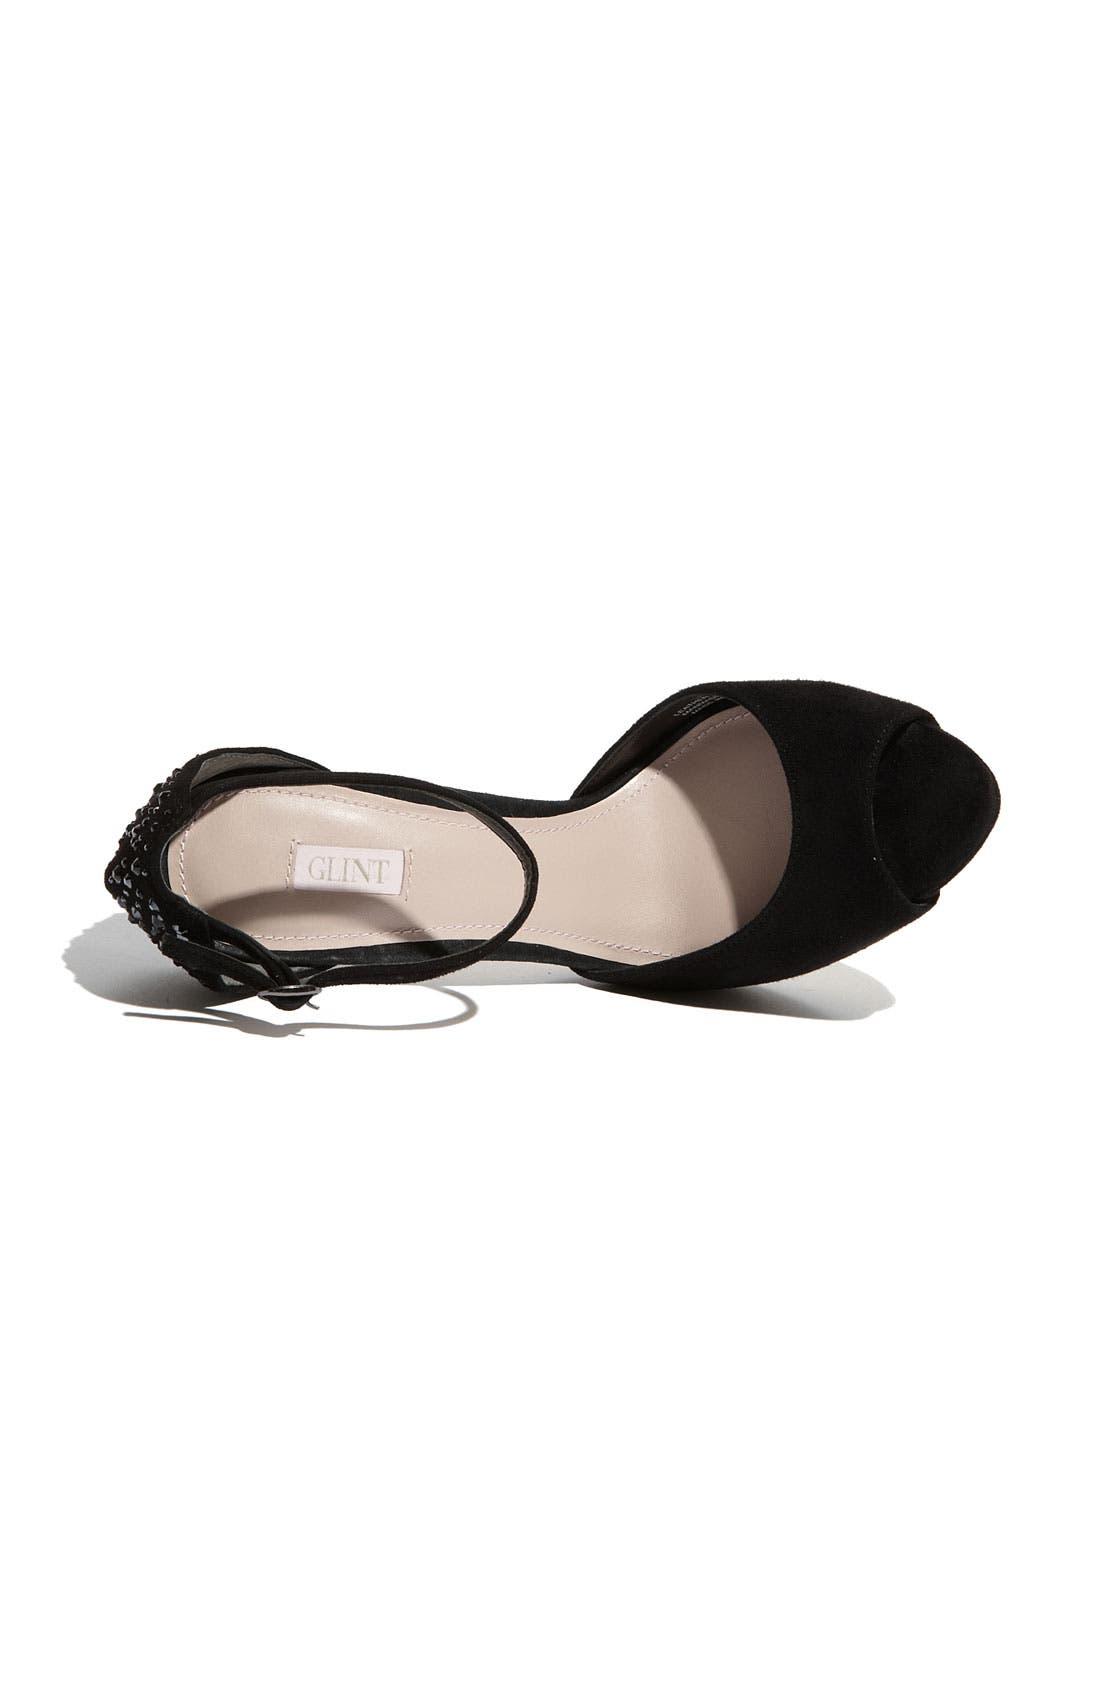 Alternate Image 3  - Glint 'Viola' Jeweled Sandal